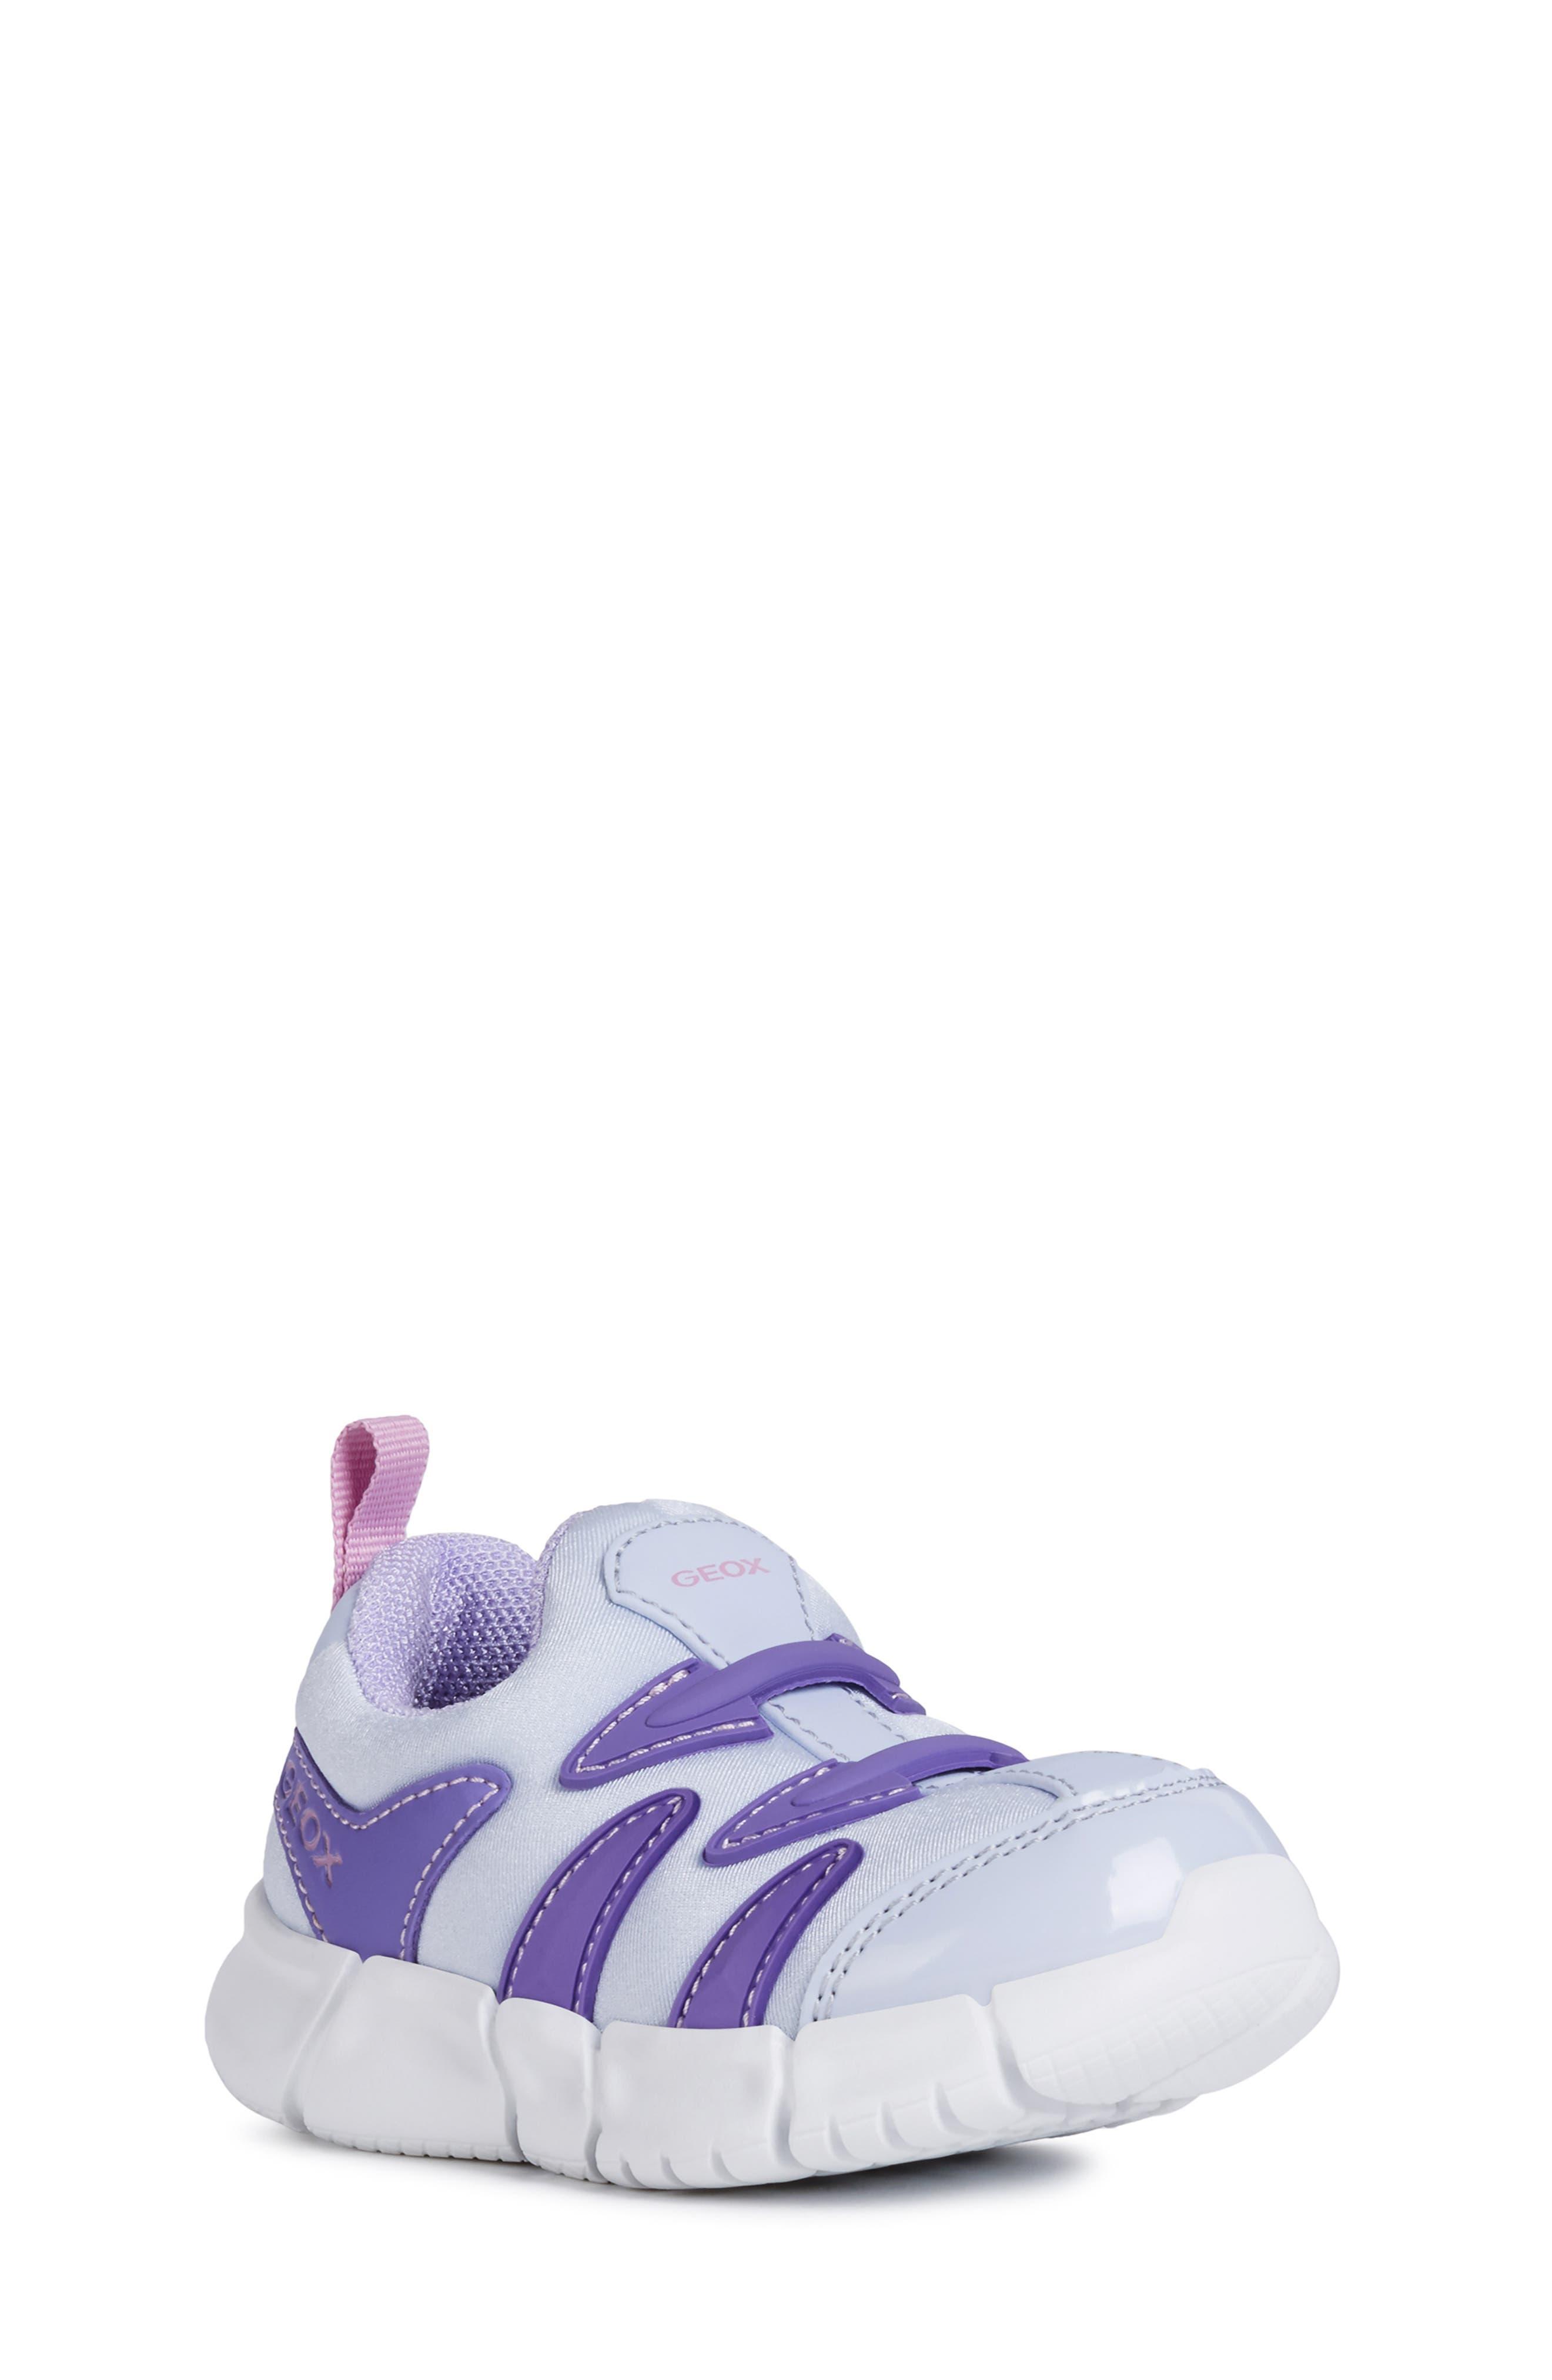 Flexyper Sneaker,                             Main thumbnail 1, color,                             SOFT SKY